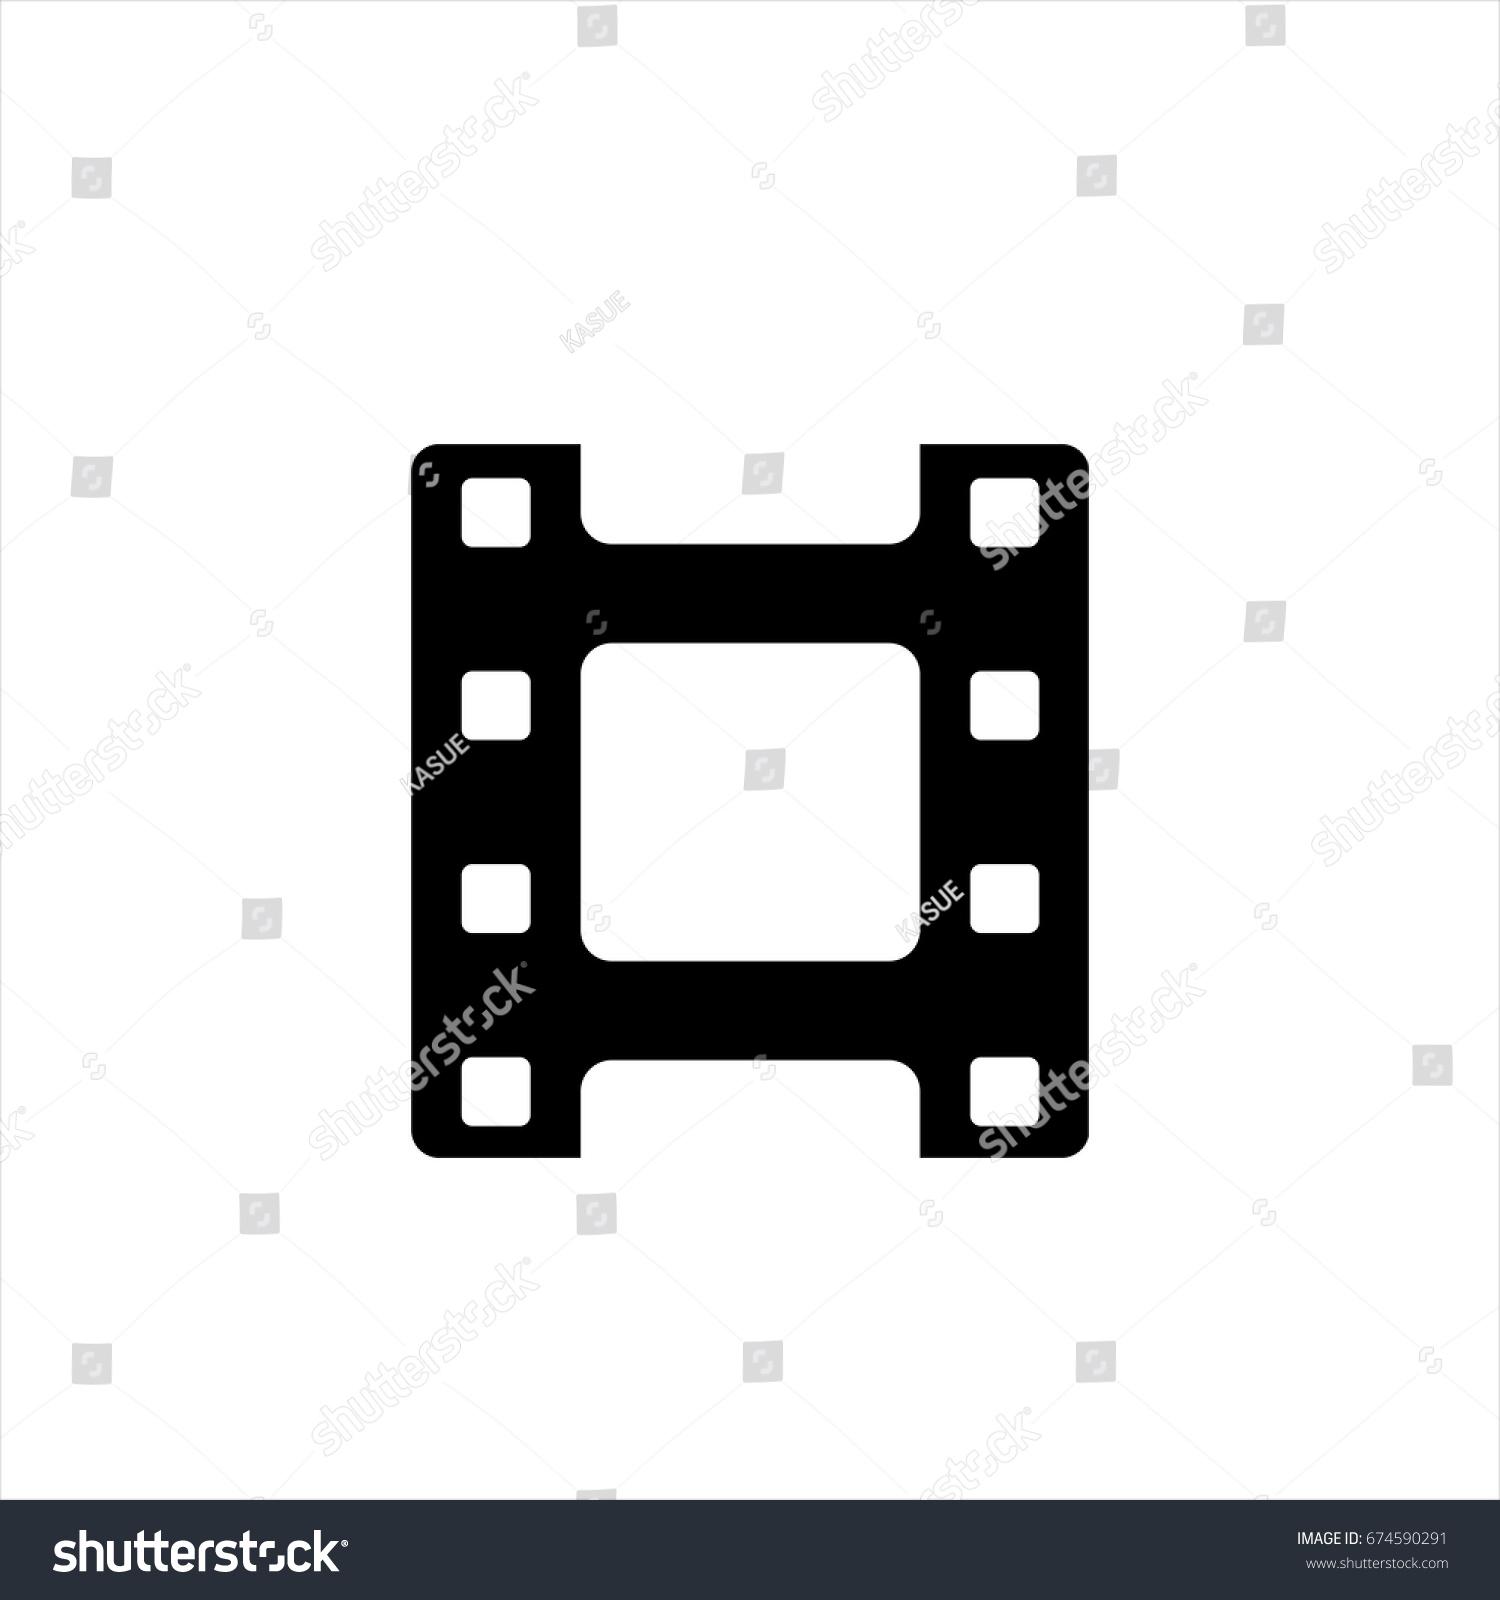 Movie film iconin trendy flat style stock vector 674590291 movie film iconin trendy flat style isolated on background movie film icon page symbol for biocorpaavc